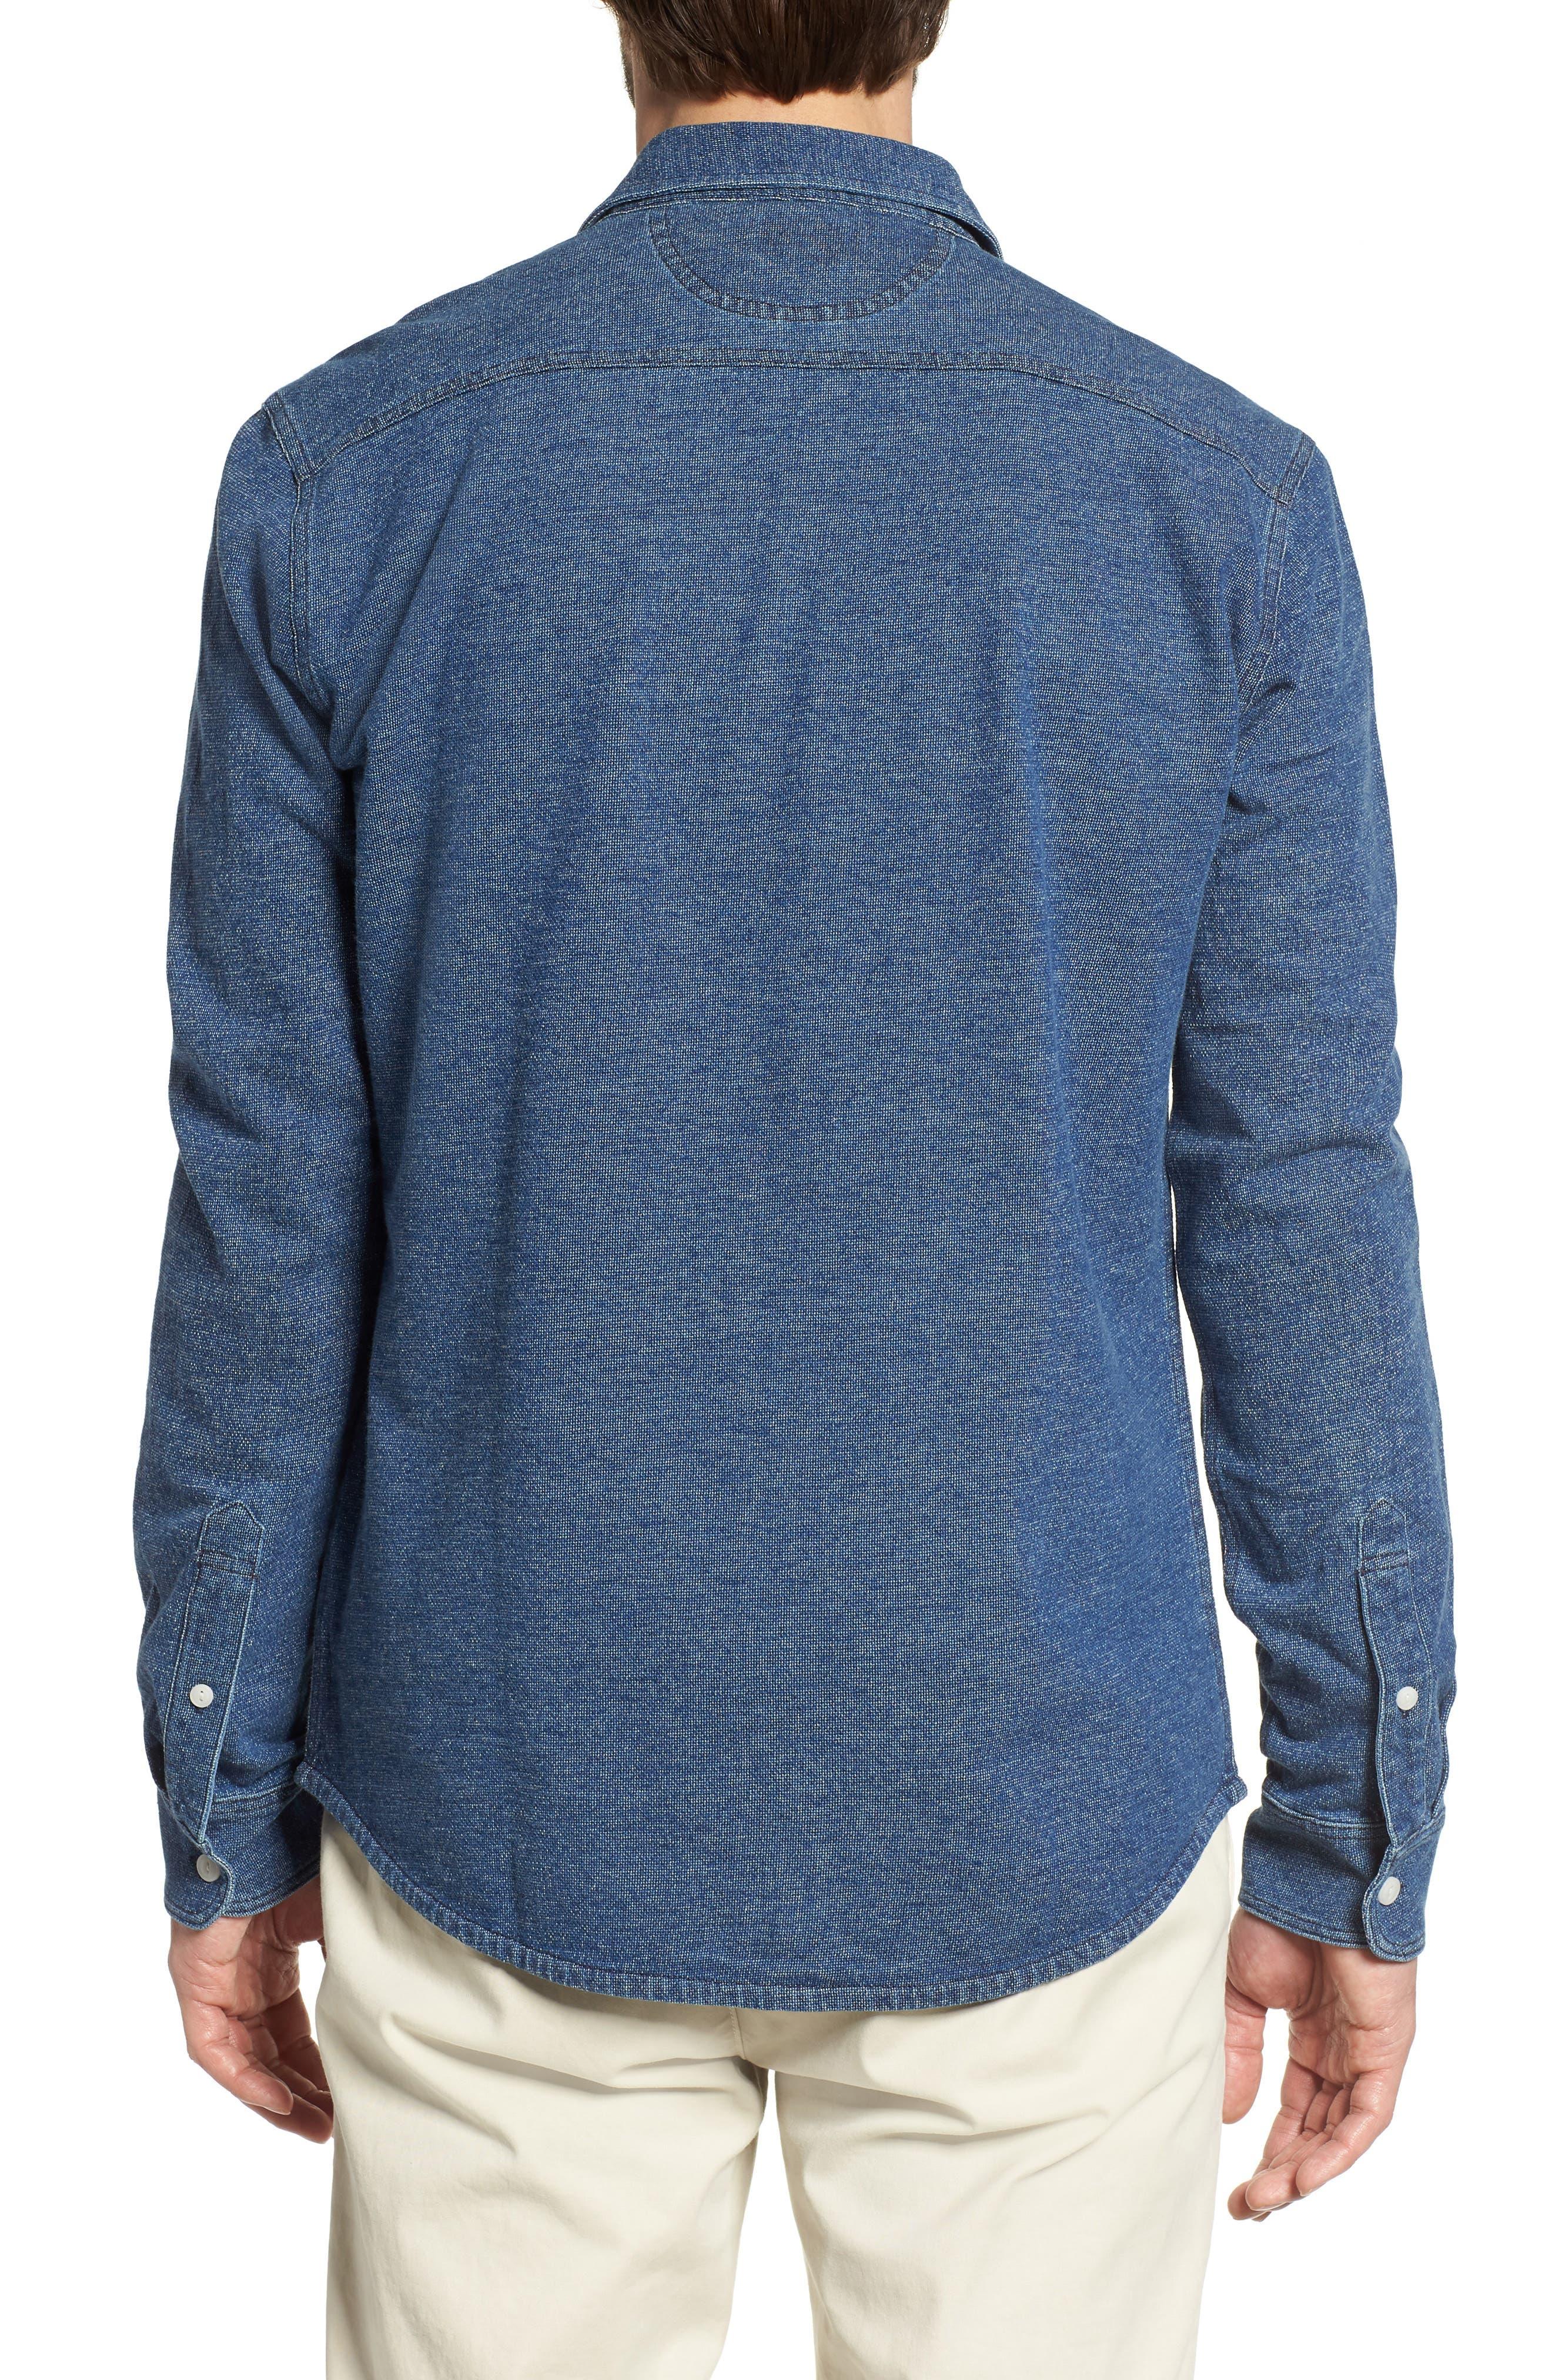 Belmar Chambray Knit Sport Shirt,                             Alternate thumbnail 2, color,                             Medium Wash Indigo